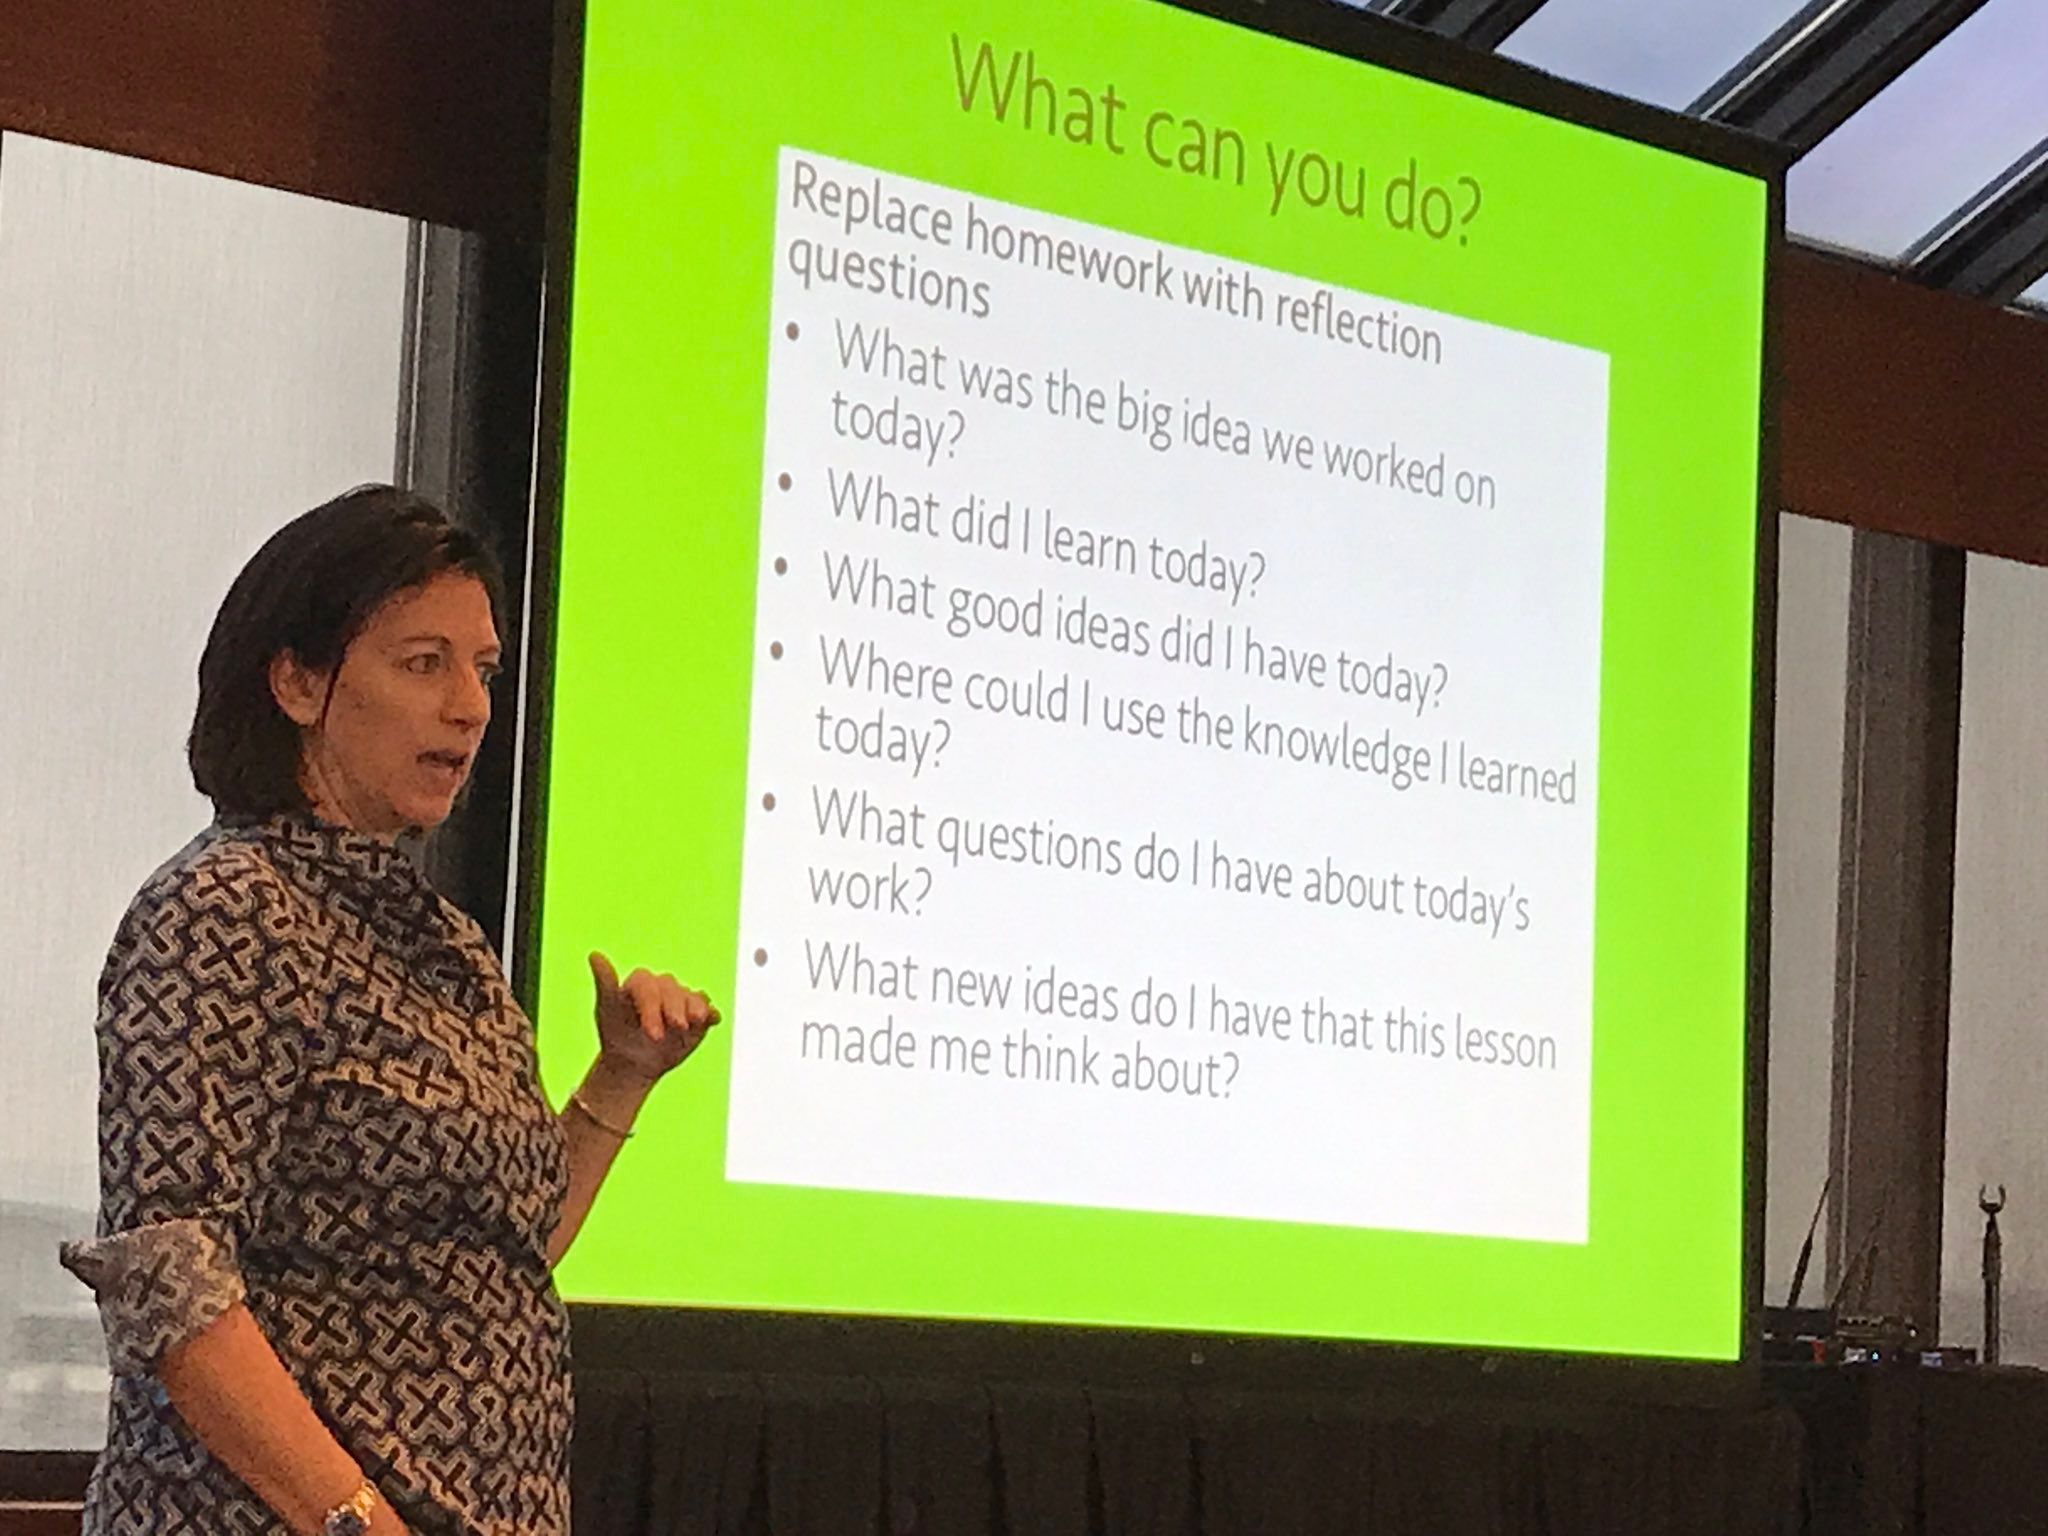 Homework Reflection Questions From Jo Boaler